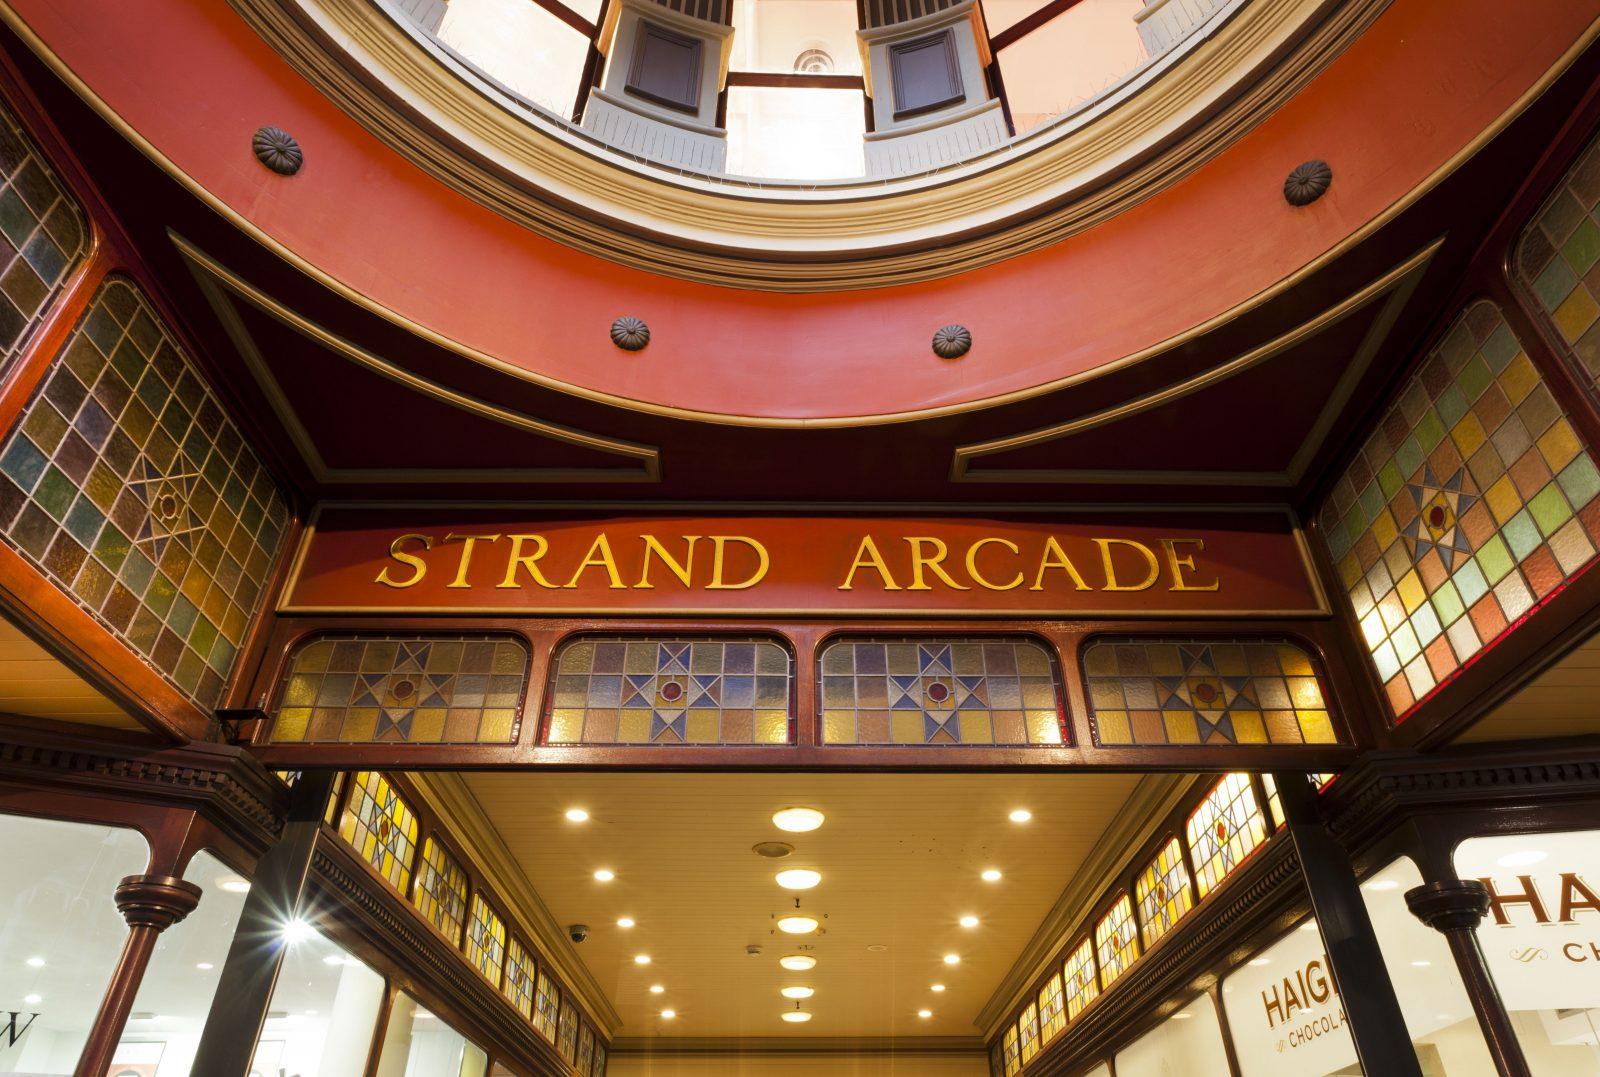 Entrance to Strand Arcade